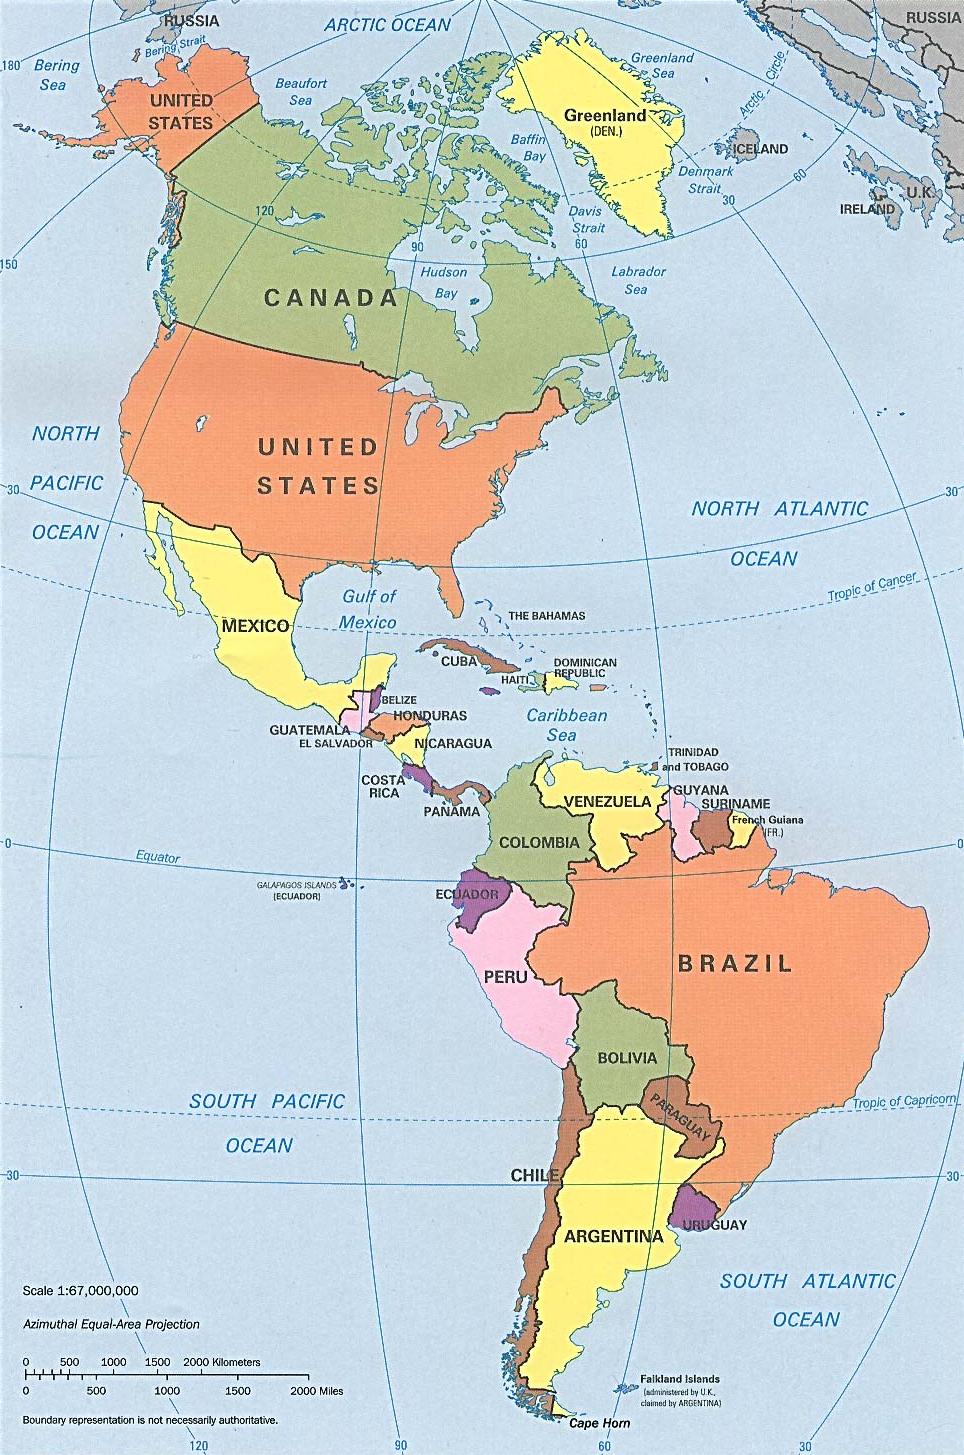 entralntelligencegencypoliticalmapofthemericasinambertazimuthalequal-areaprojection